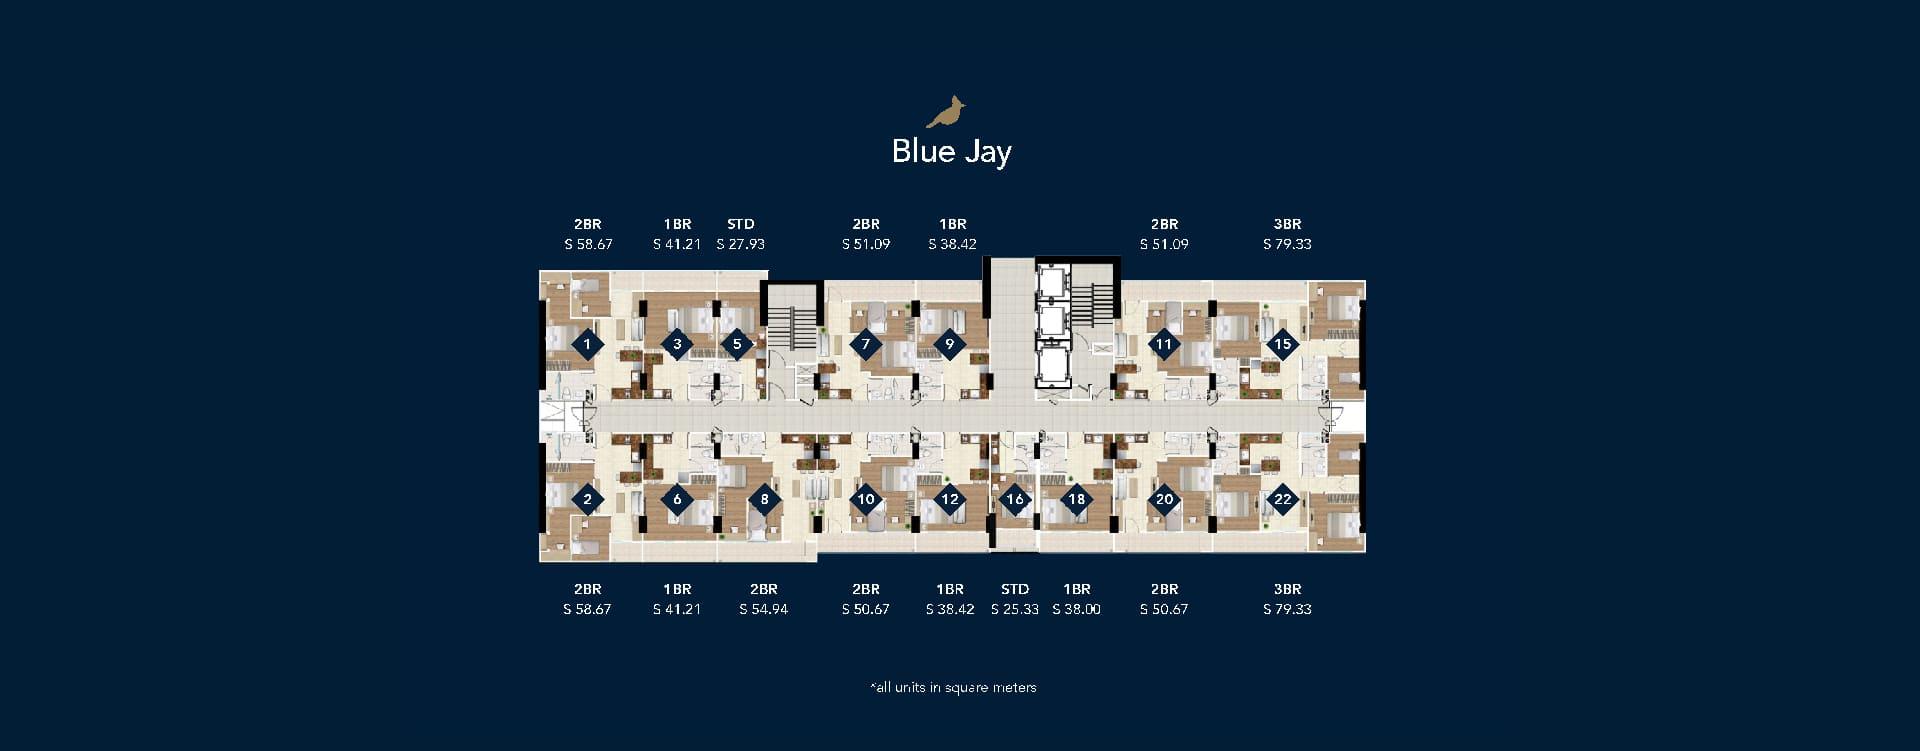 Site-Plan-Tower-Blue-Jay-Daan-Mogot-City